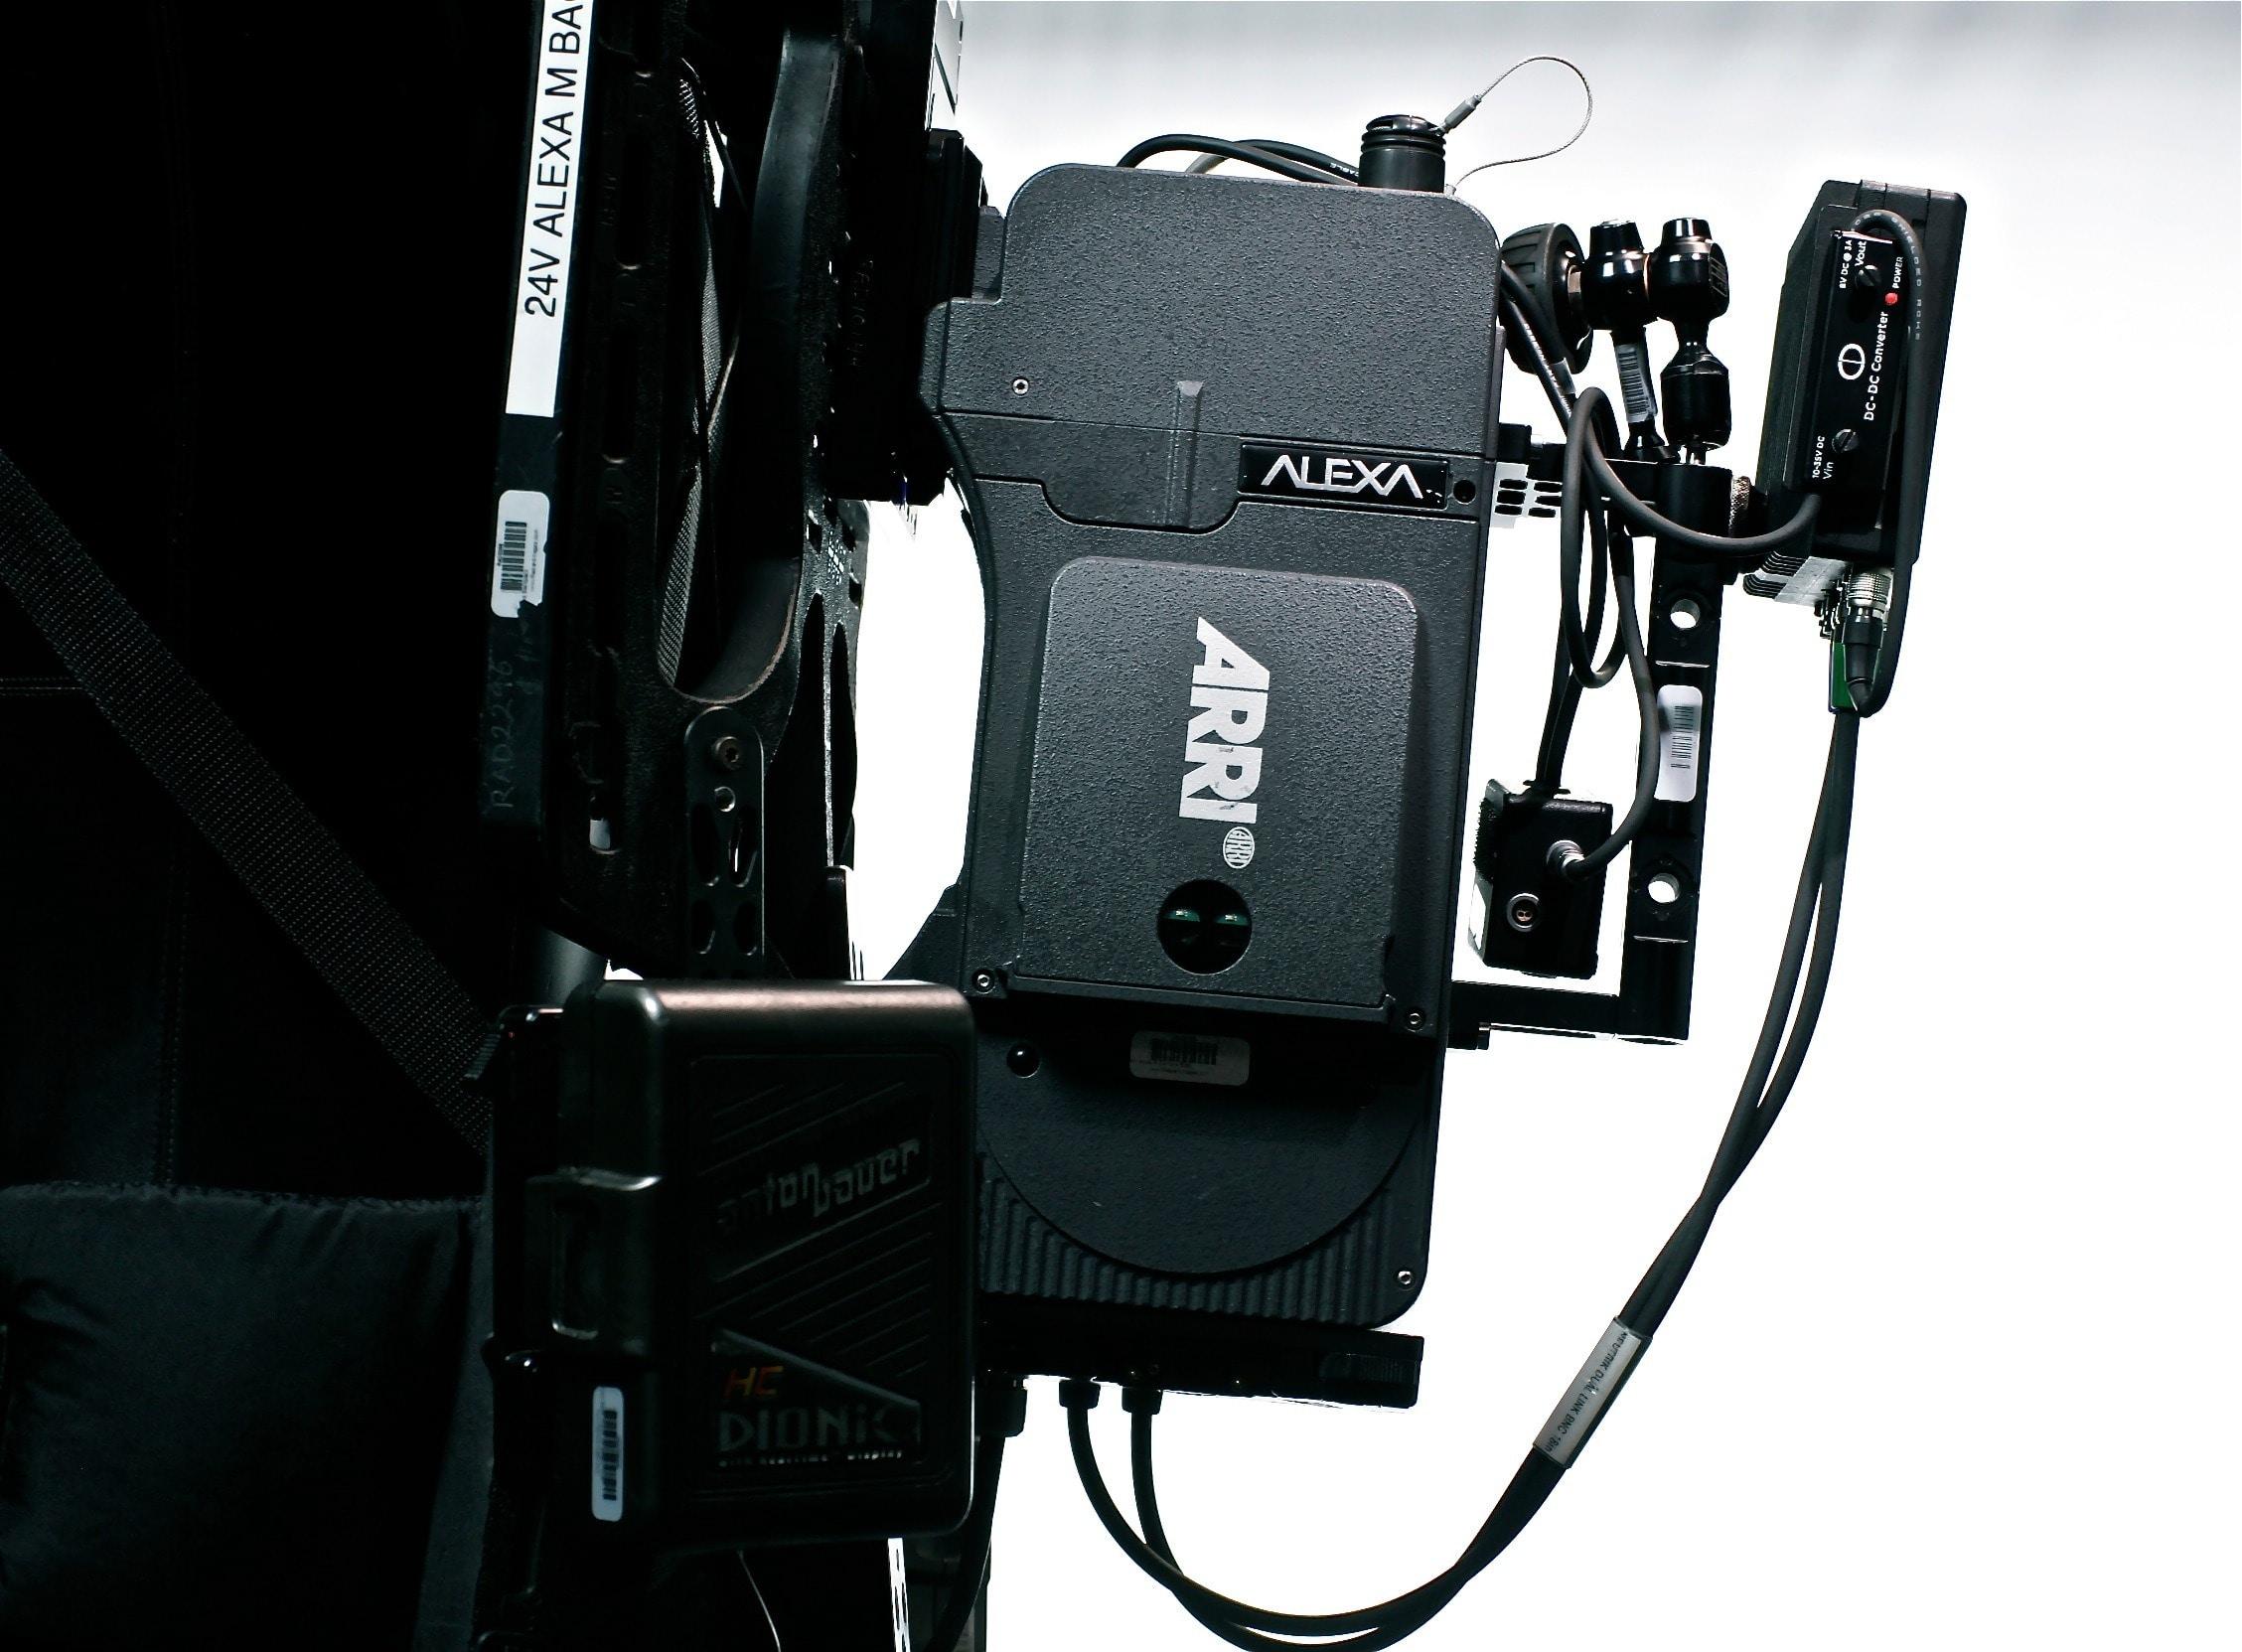 Black ARRI Alexa movie camera recording equipment technology